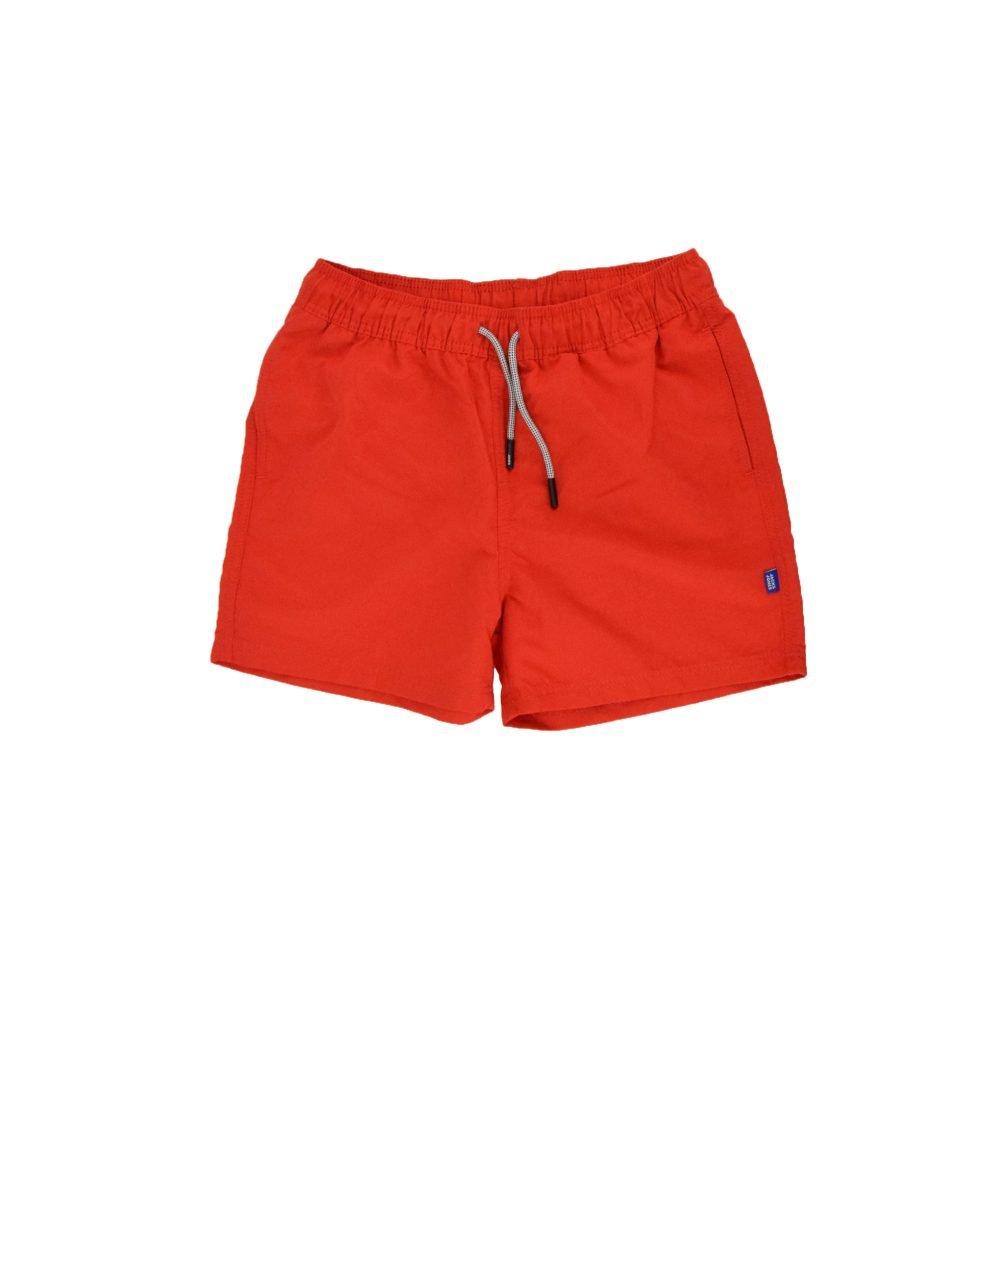 Jack & Jones Aruba Swim Shorts Solid Junior (12166328) Fiery Red